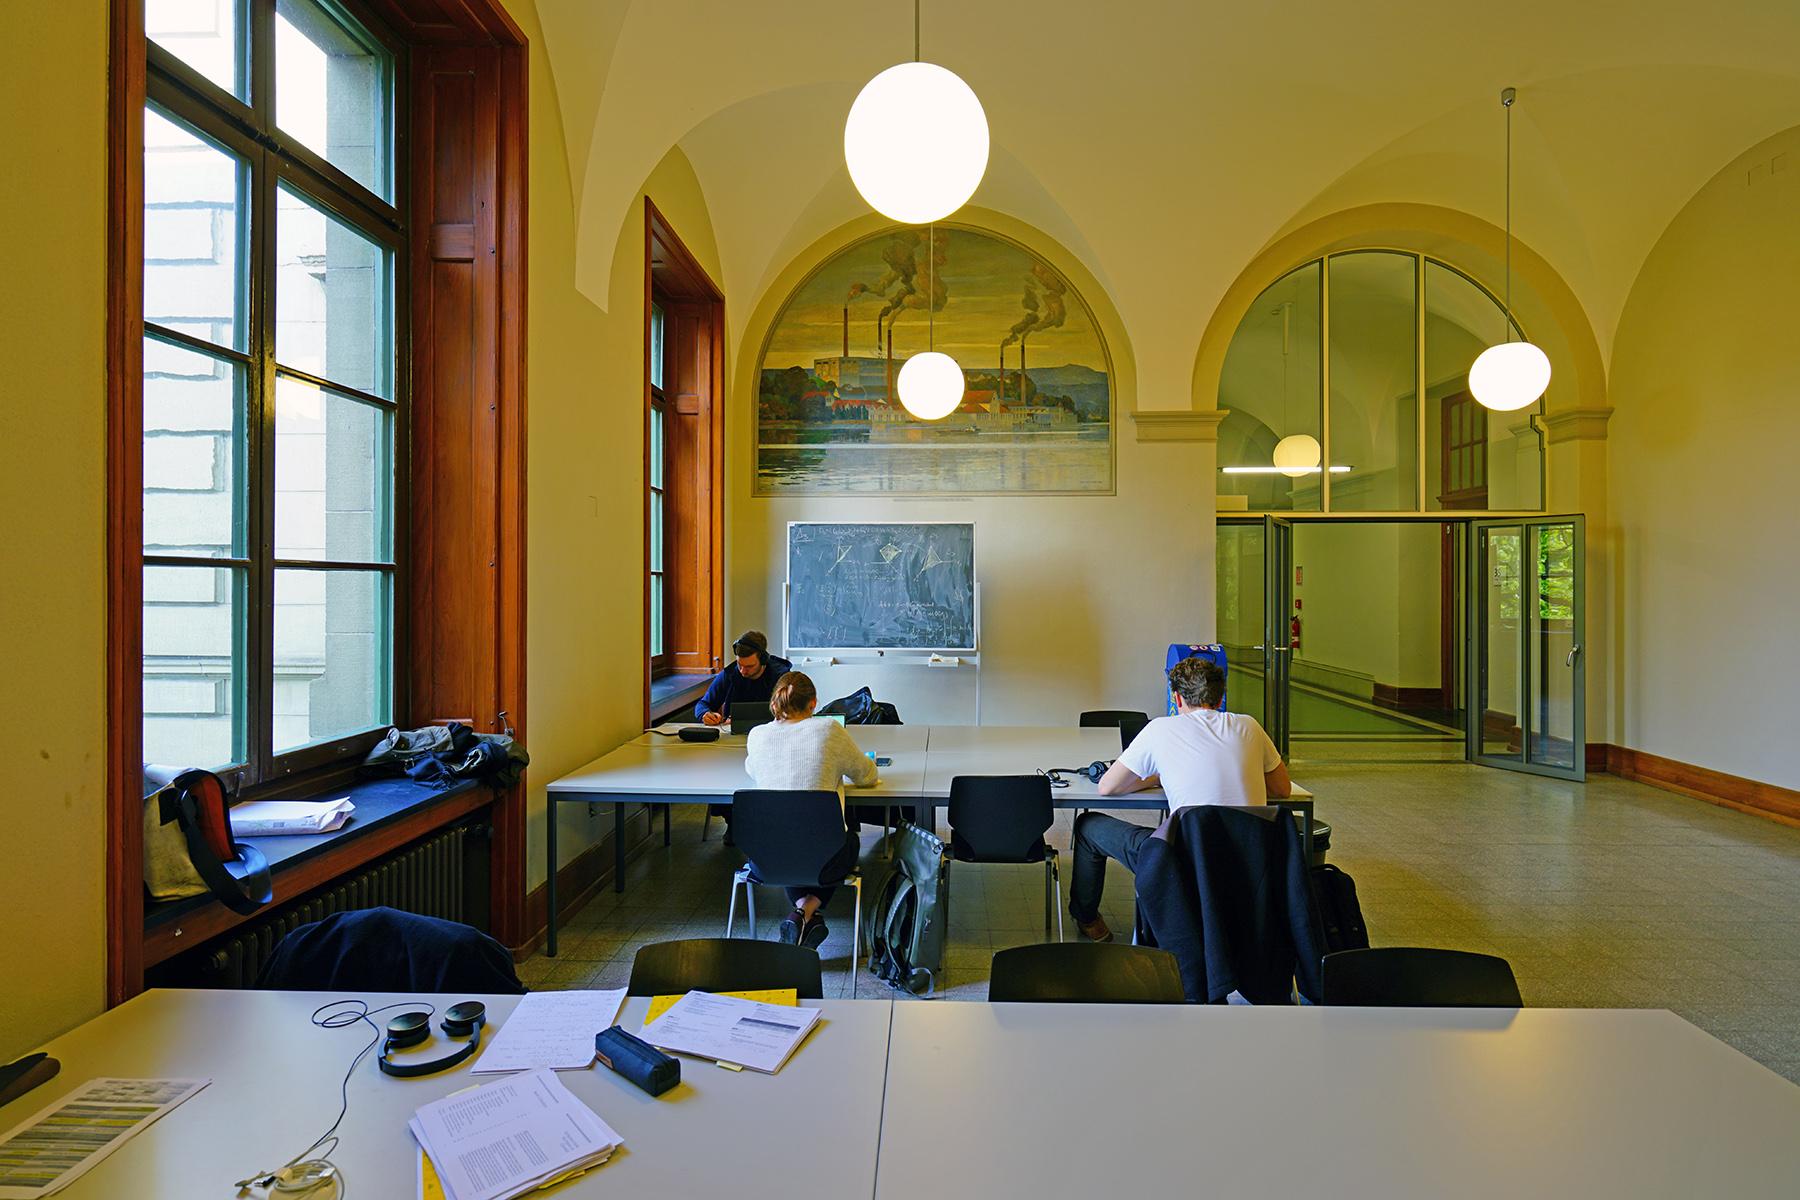 A study area at ETH Zürich